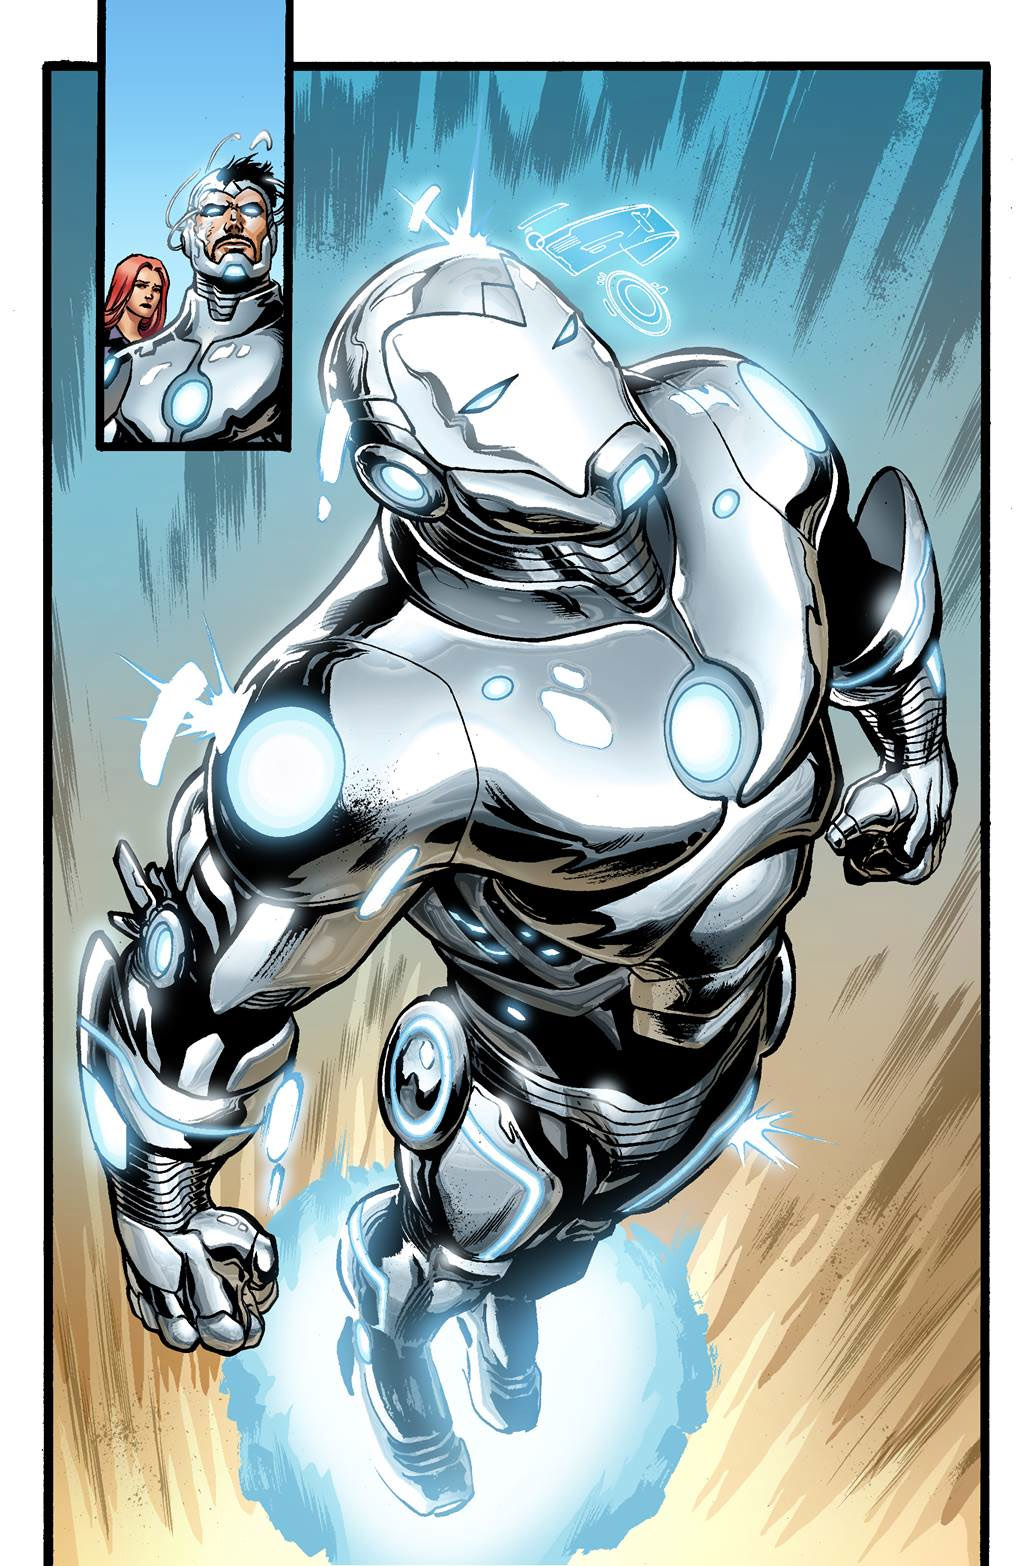 Superior Iron Man 1 Goes on